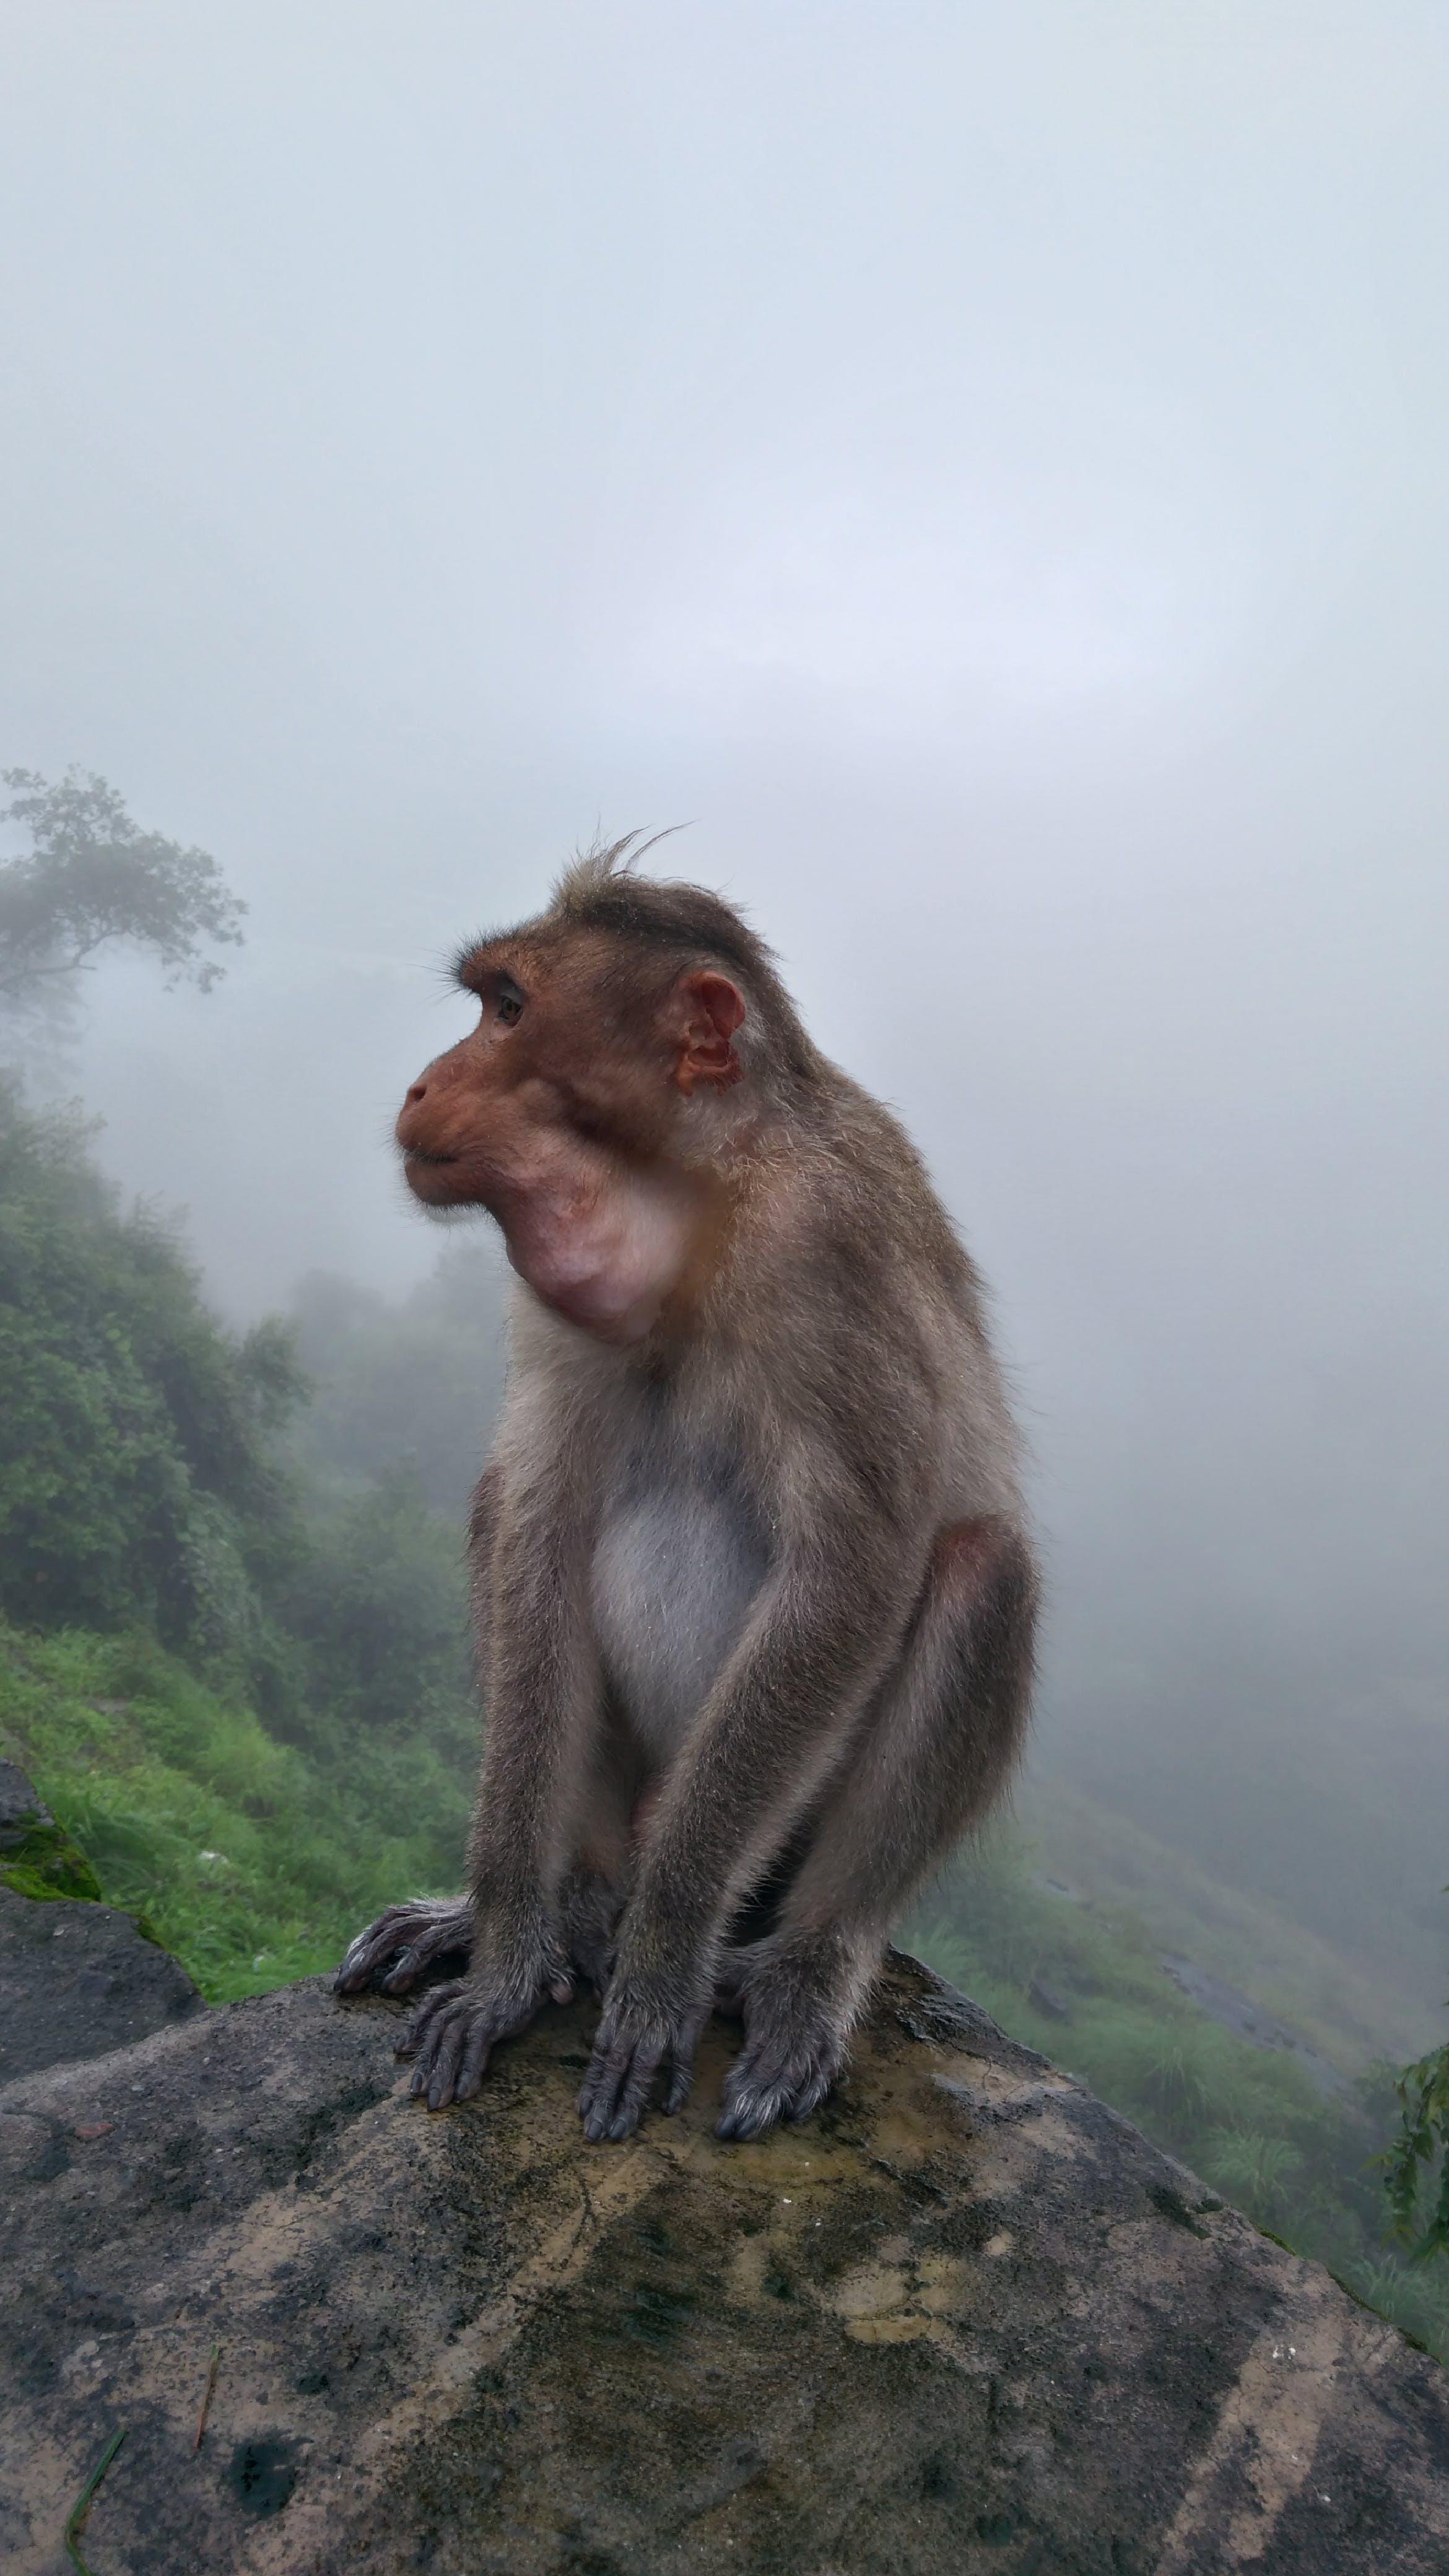 Free stock photo of monkey, monkey mountain, monkey sitting